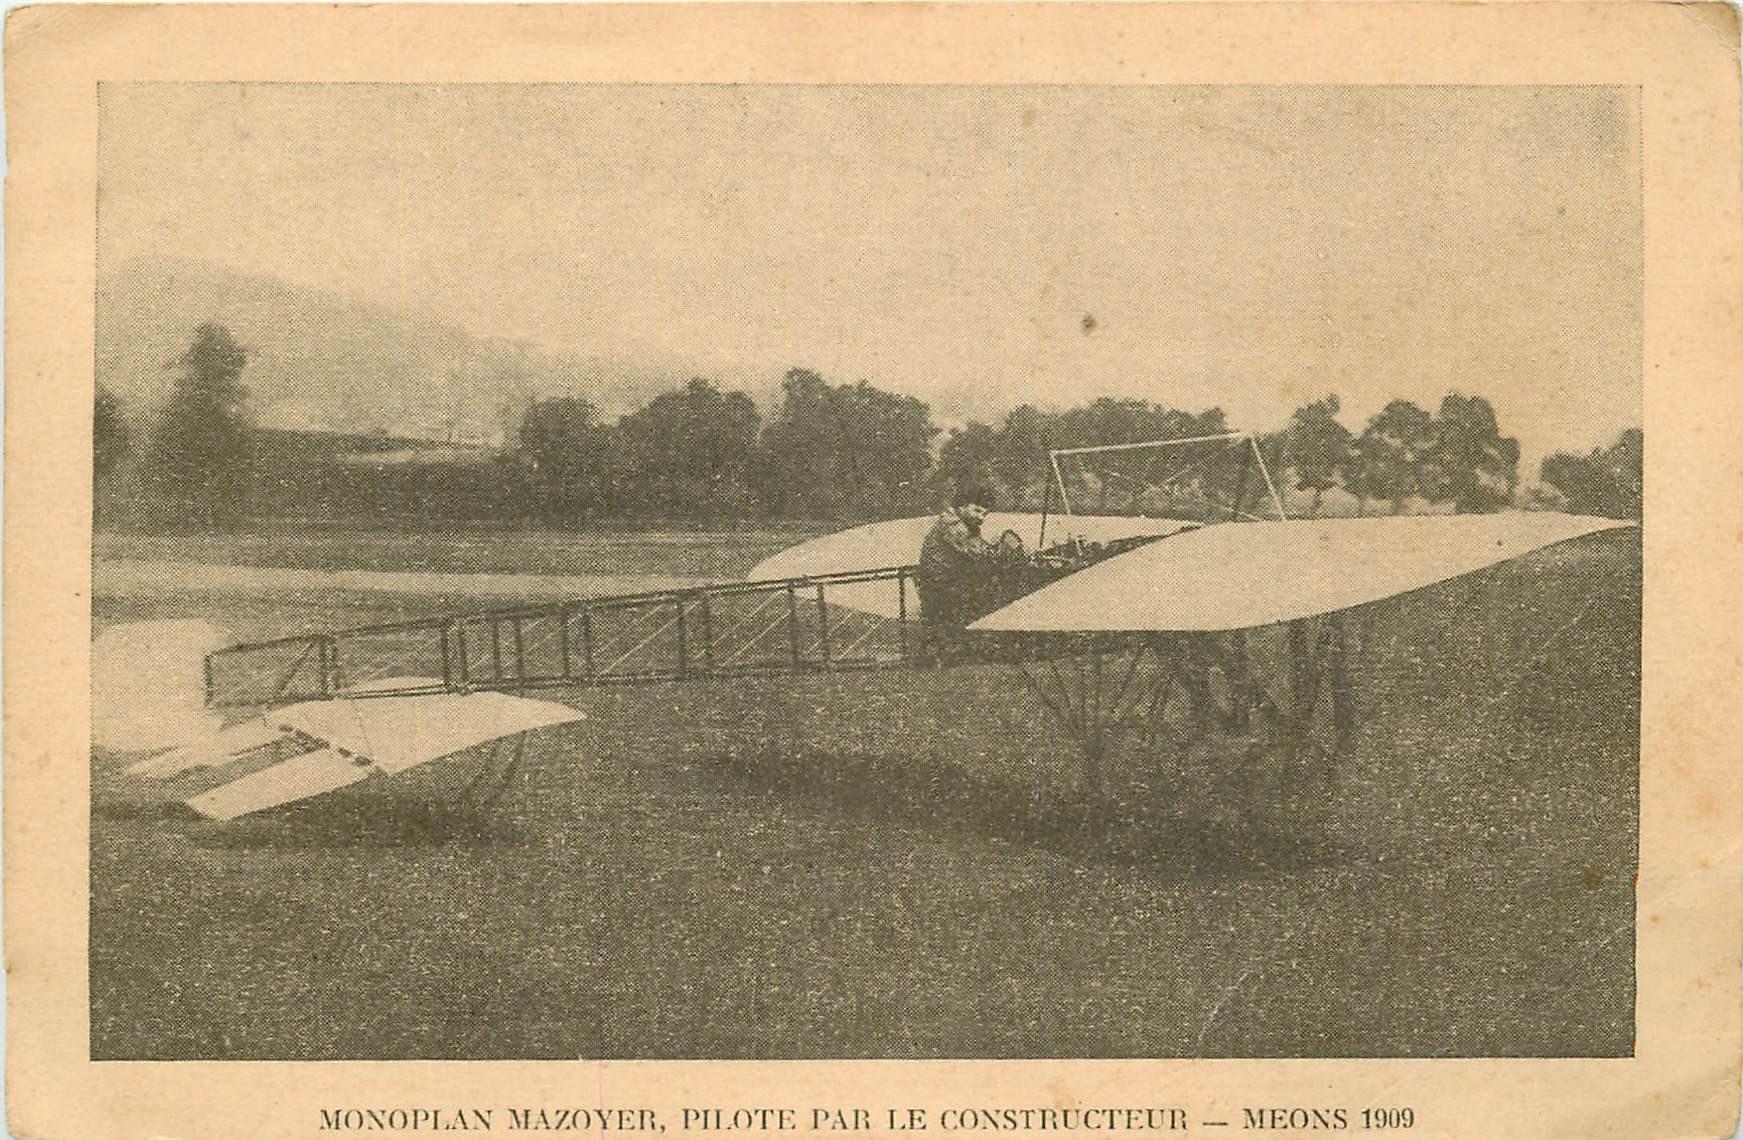 WW AVIATION. Monoplan Mazoyer piloté par Méons en 1909